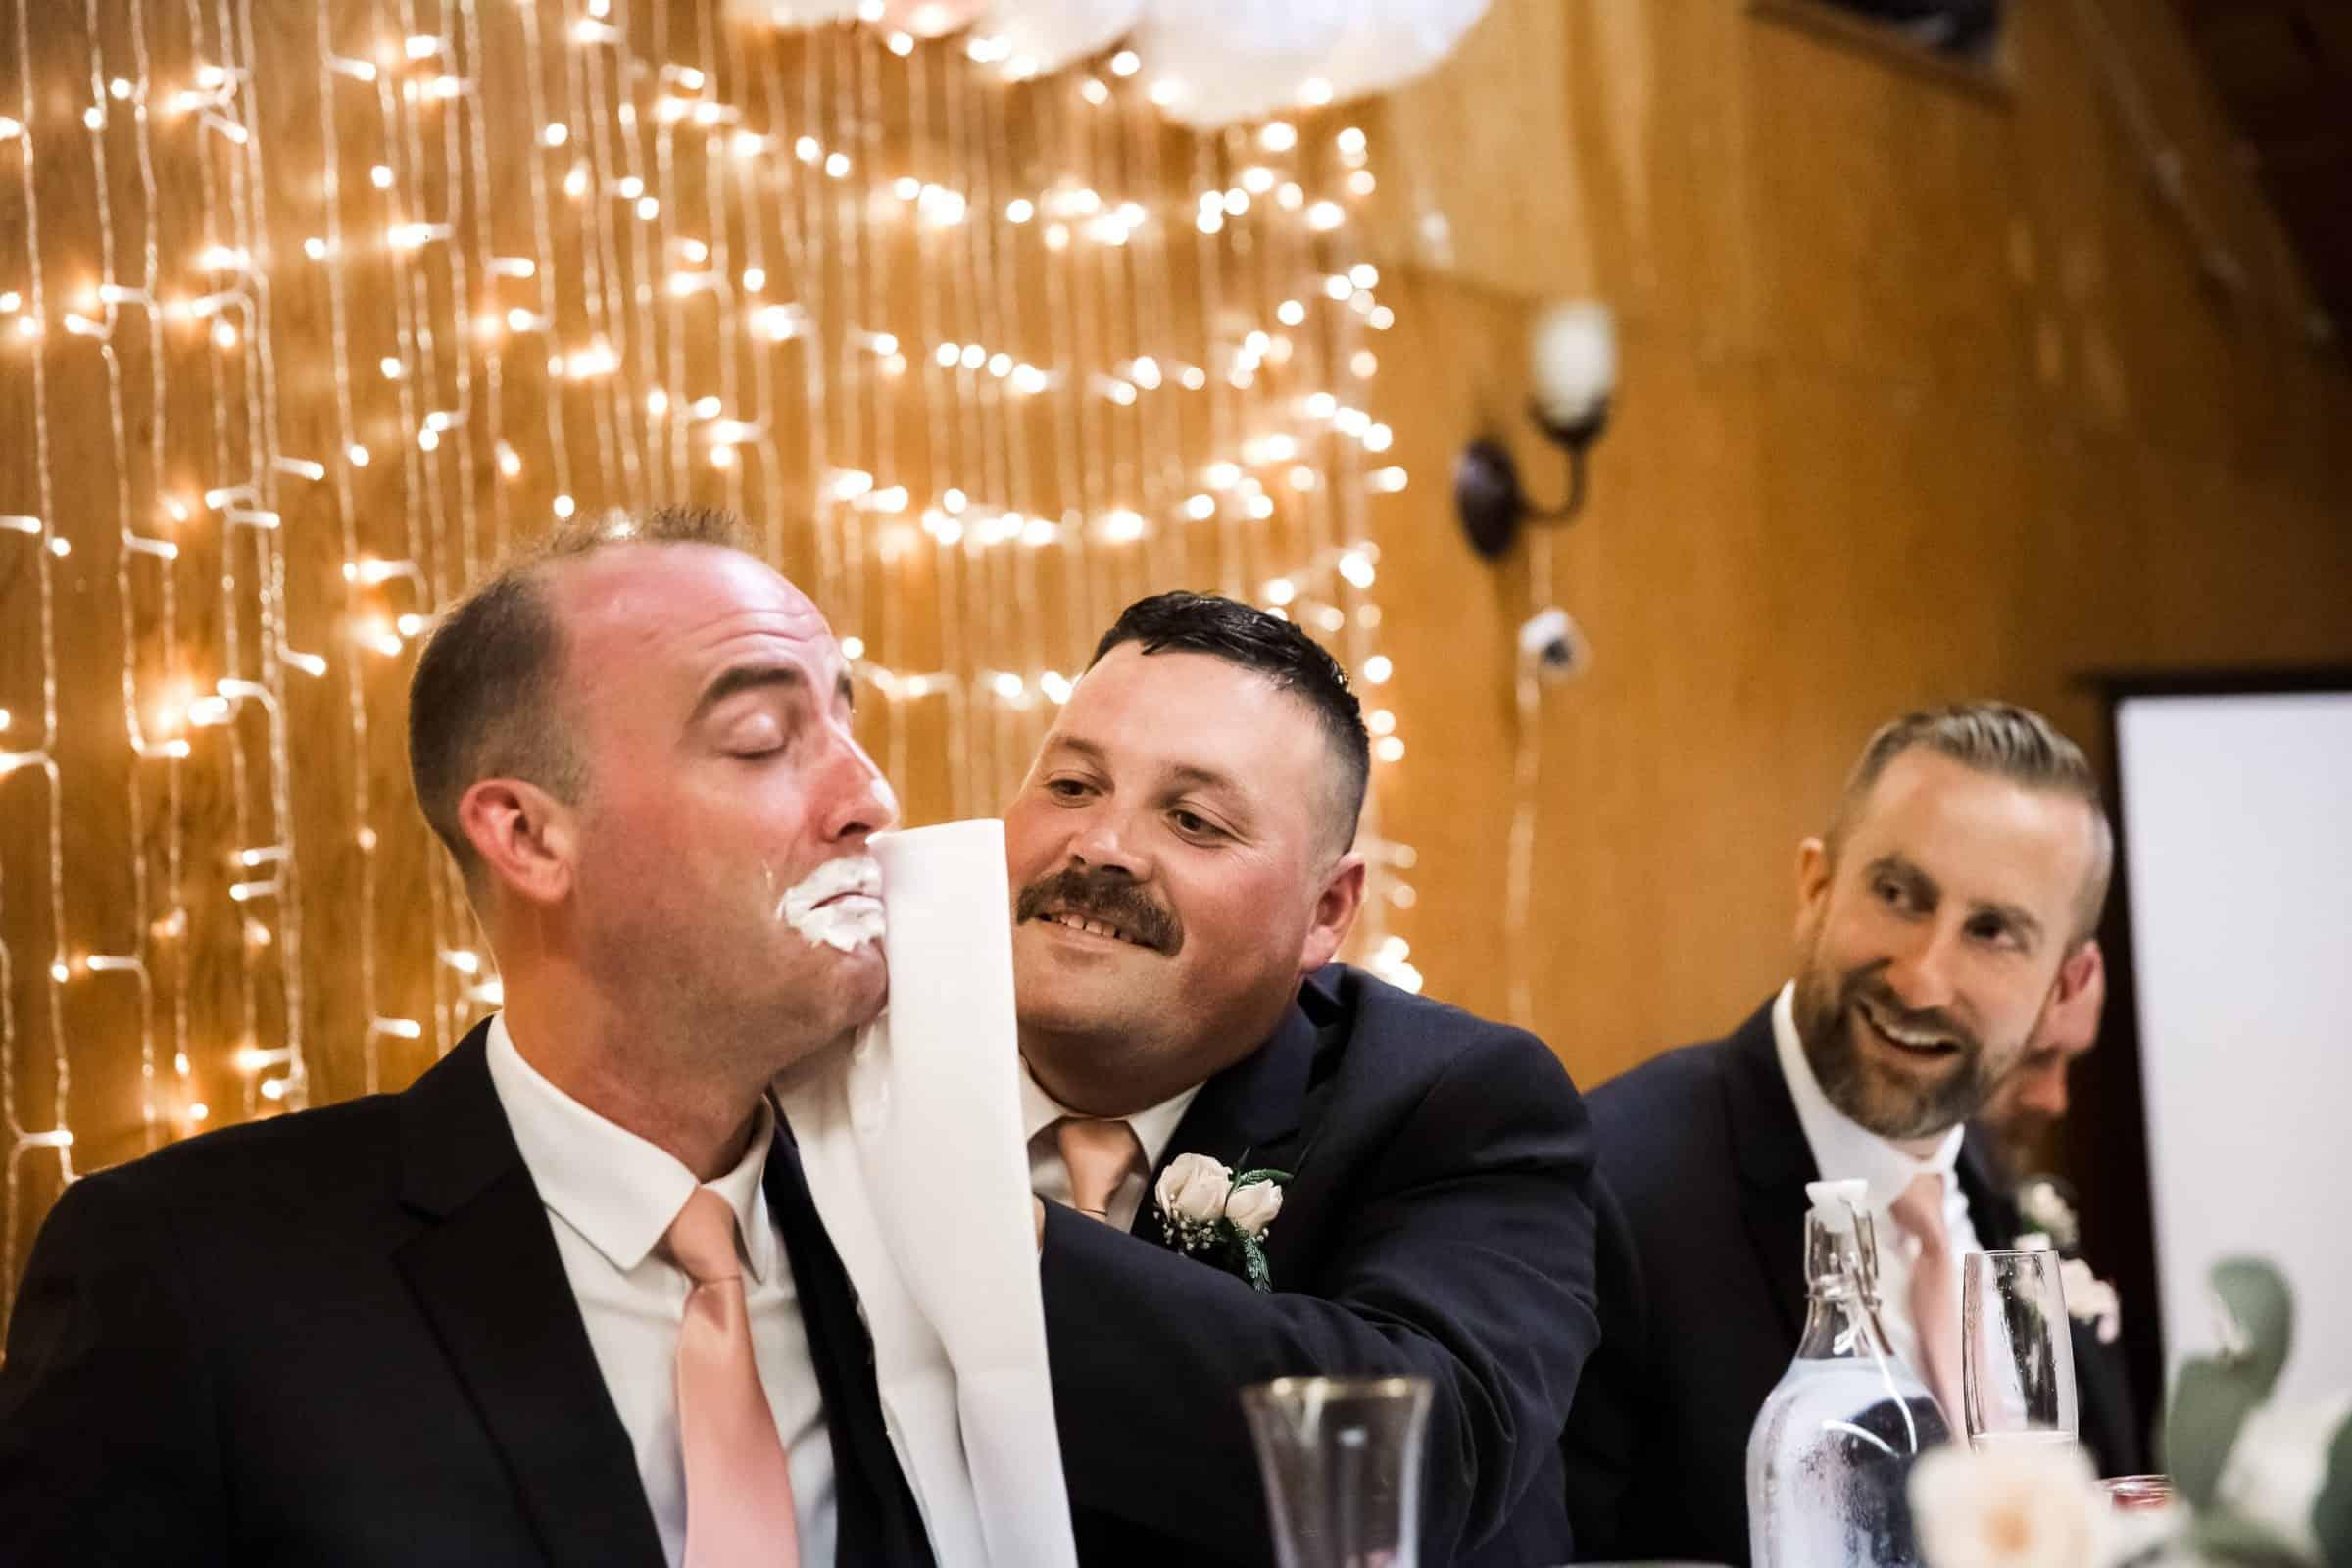 groomsman wiping cake off groom's face